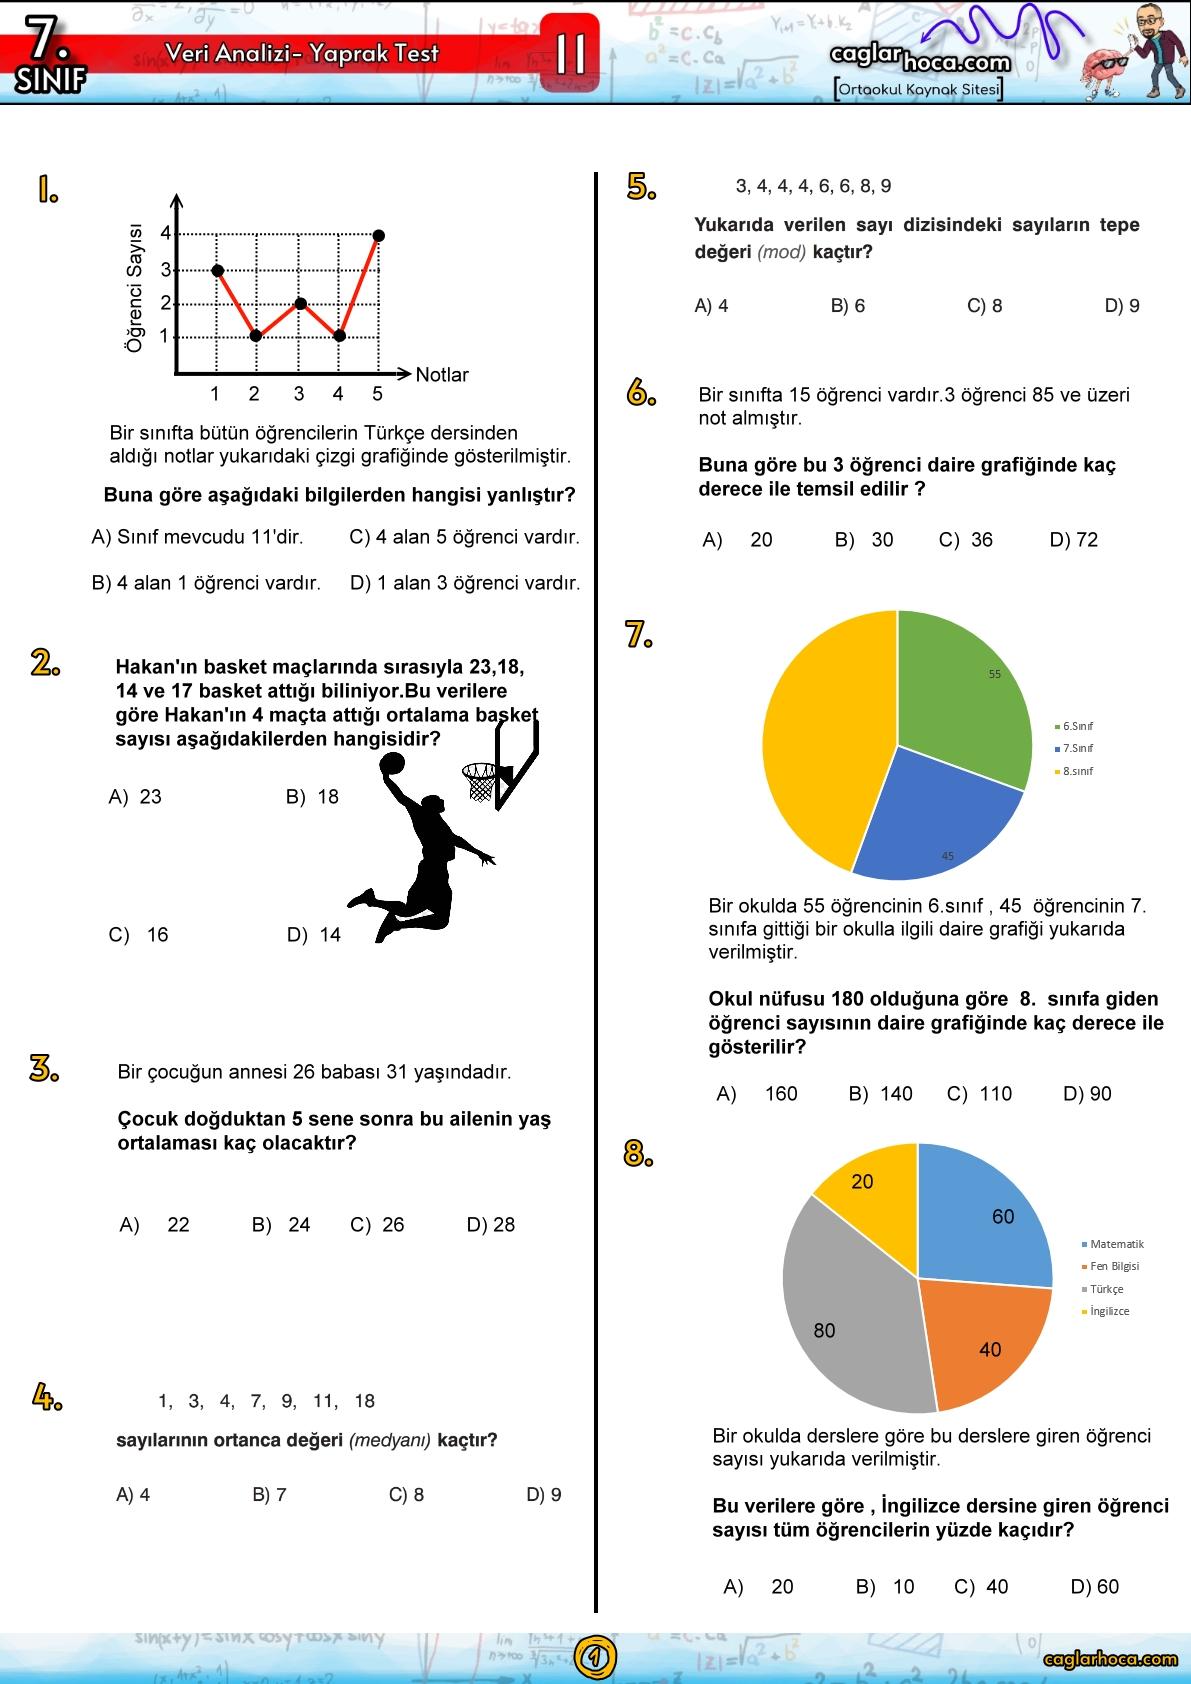 7.Sınıf 11.Ünite Veri Analizi Yaprak Test